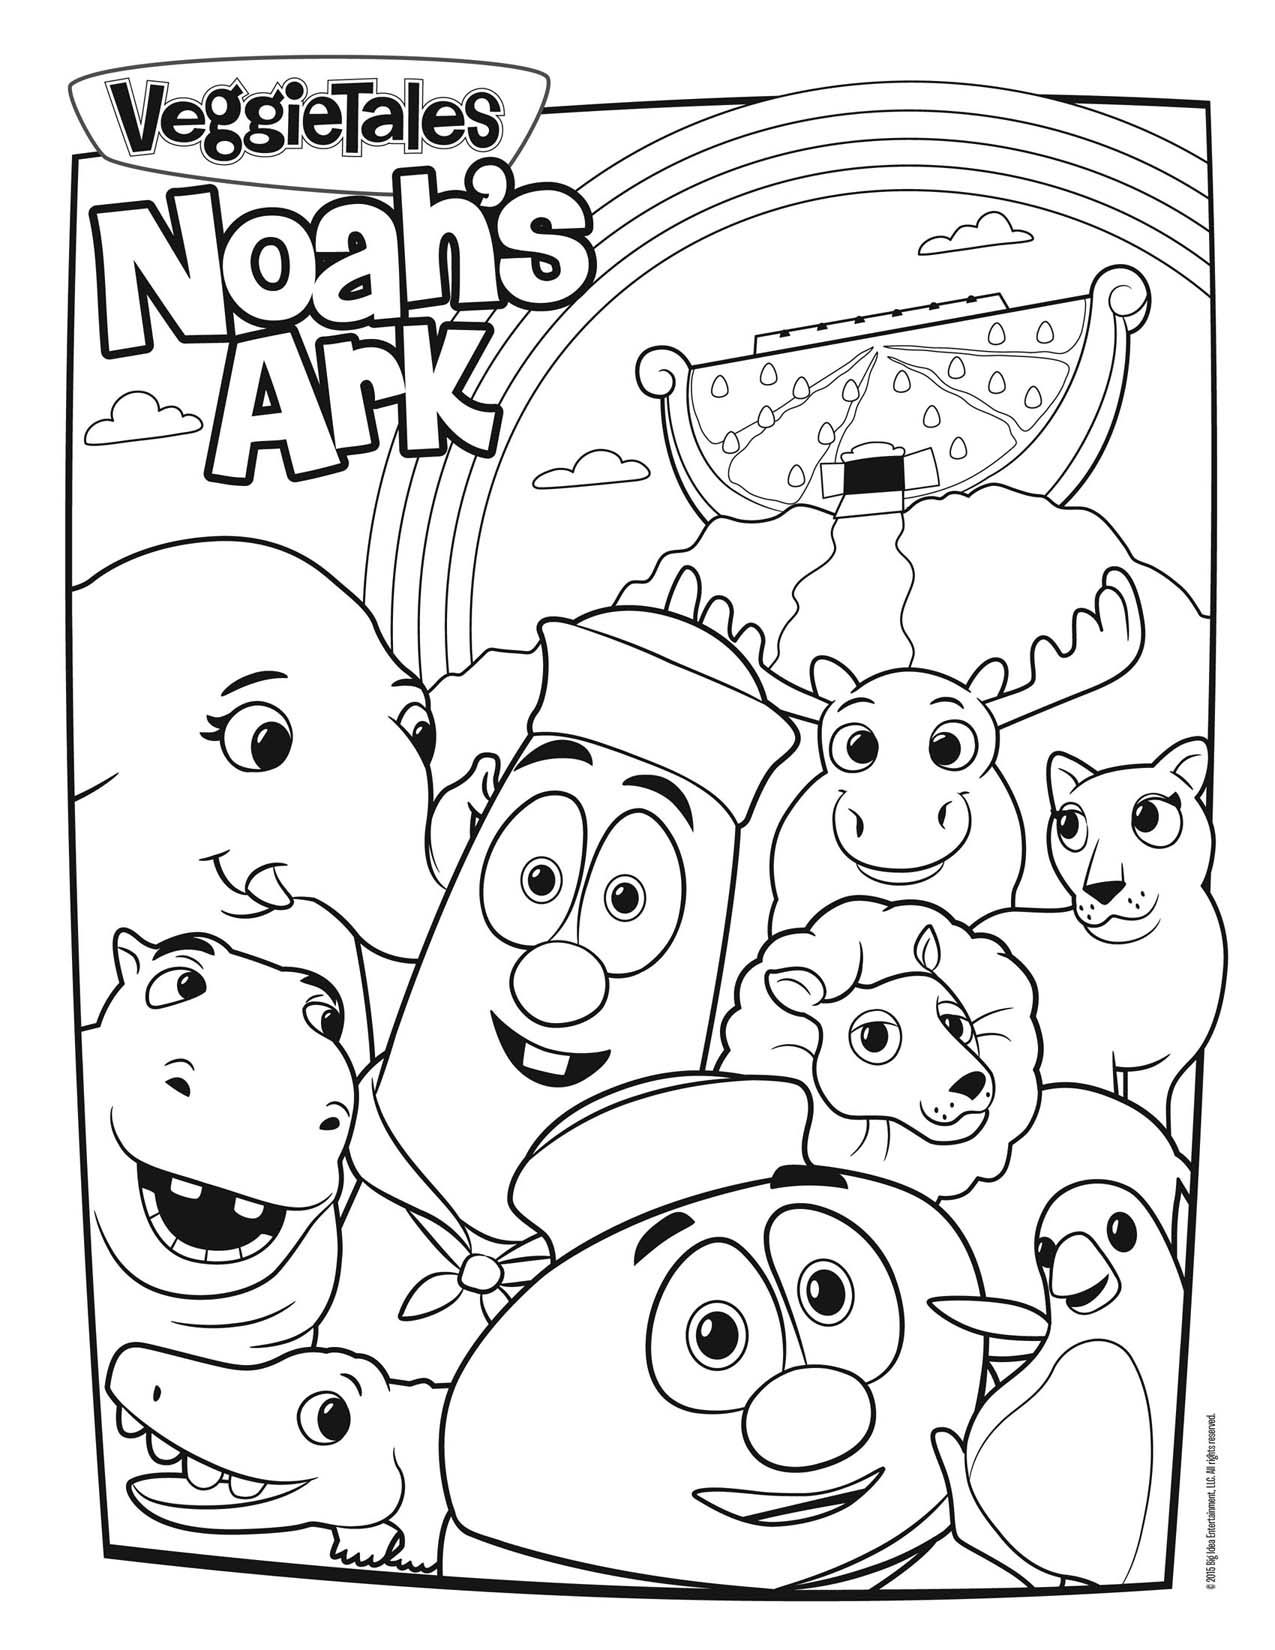 Veggietales Noah S Ark Coloring Page Tsum Tsum Coloring Pages